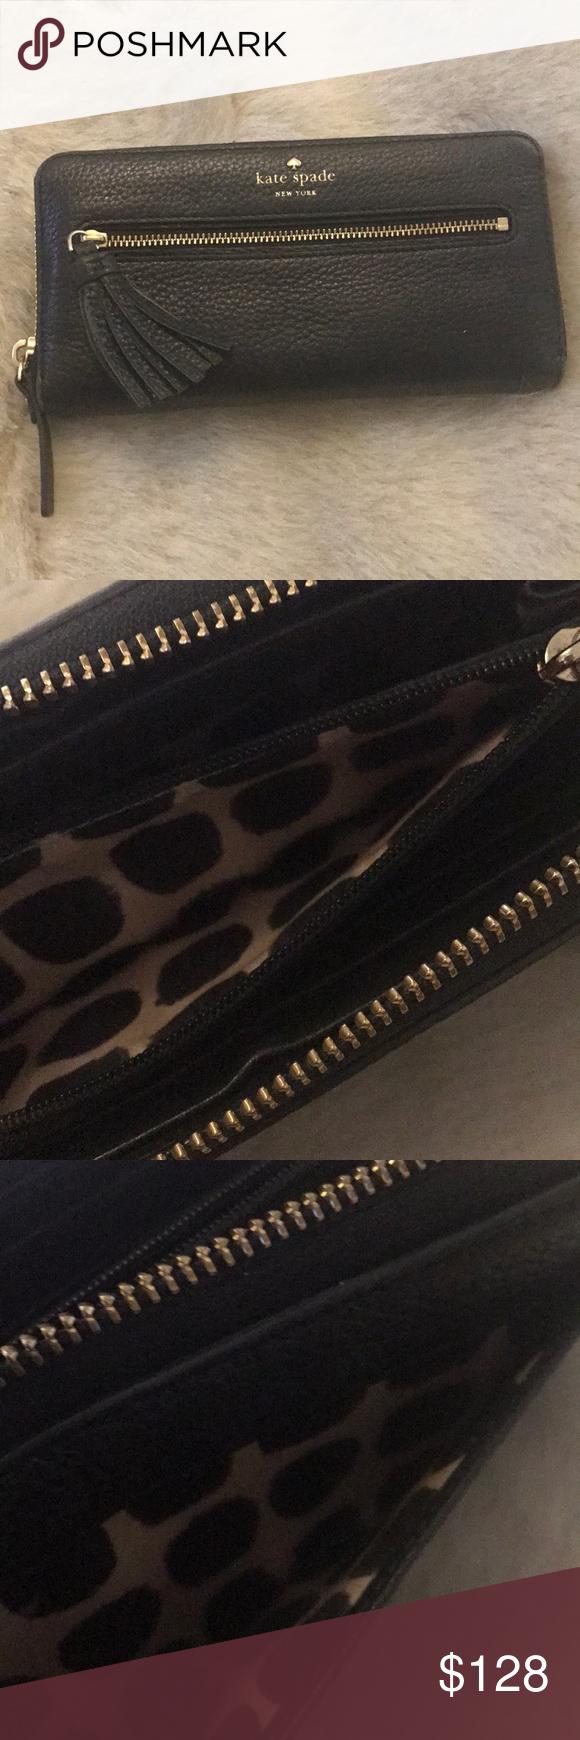 ❤️❤️HP⭐️AUTHENTIC KATE SPADE TASSEL WALLET Authentic Kate Spade Wallet. Zip around Wallet. Tassel de...